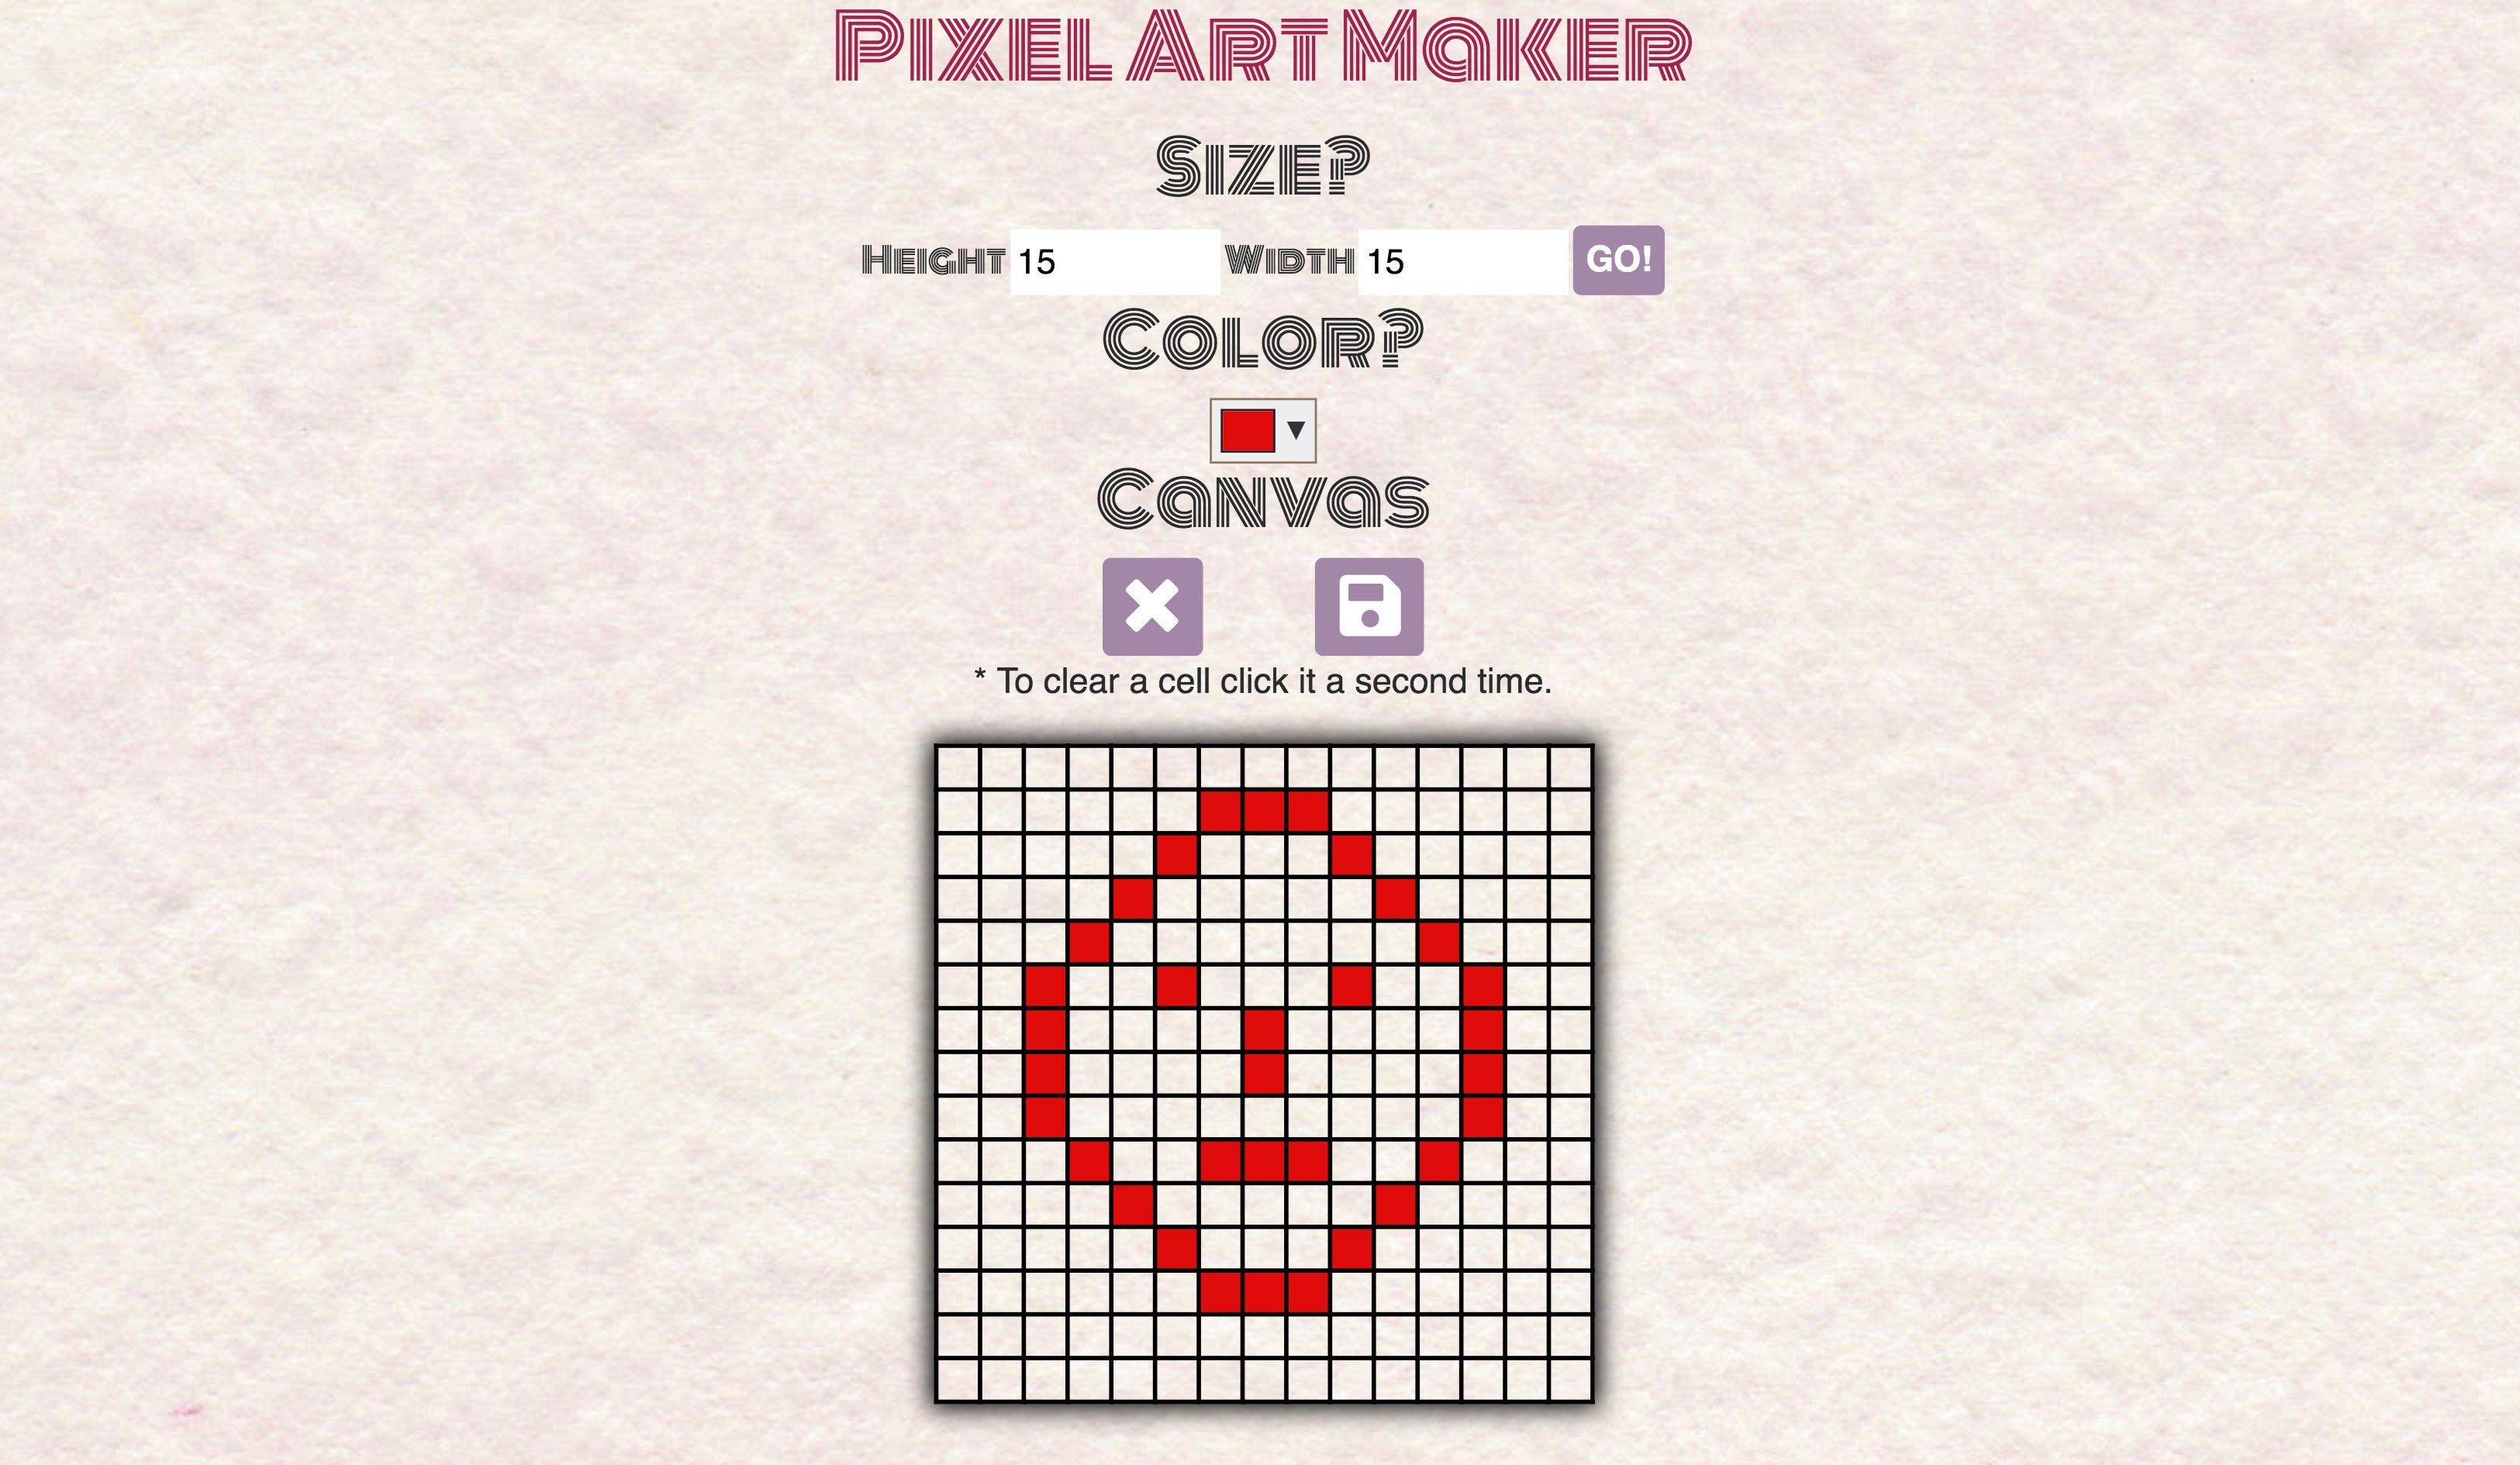 Pixel Art Maker Create fun art using just pixels with